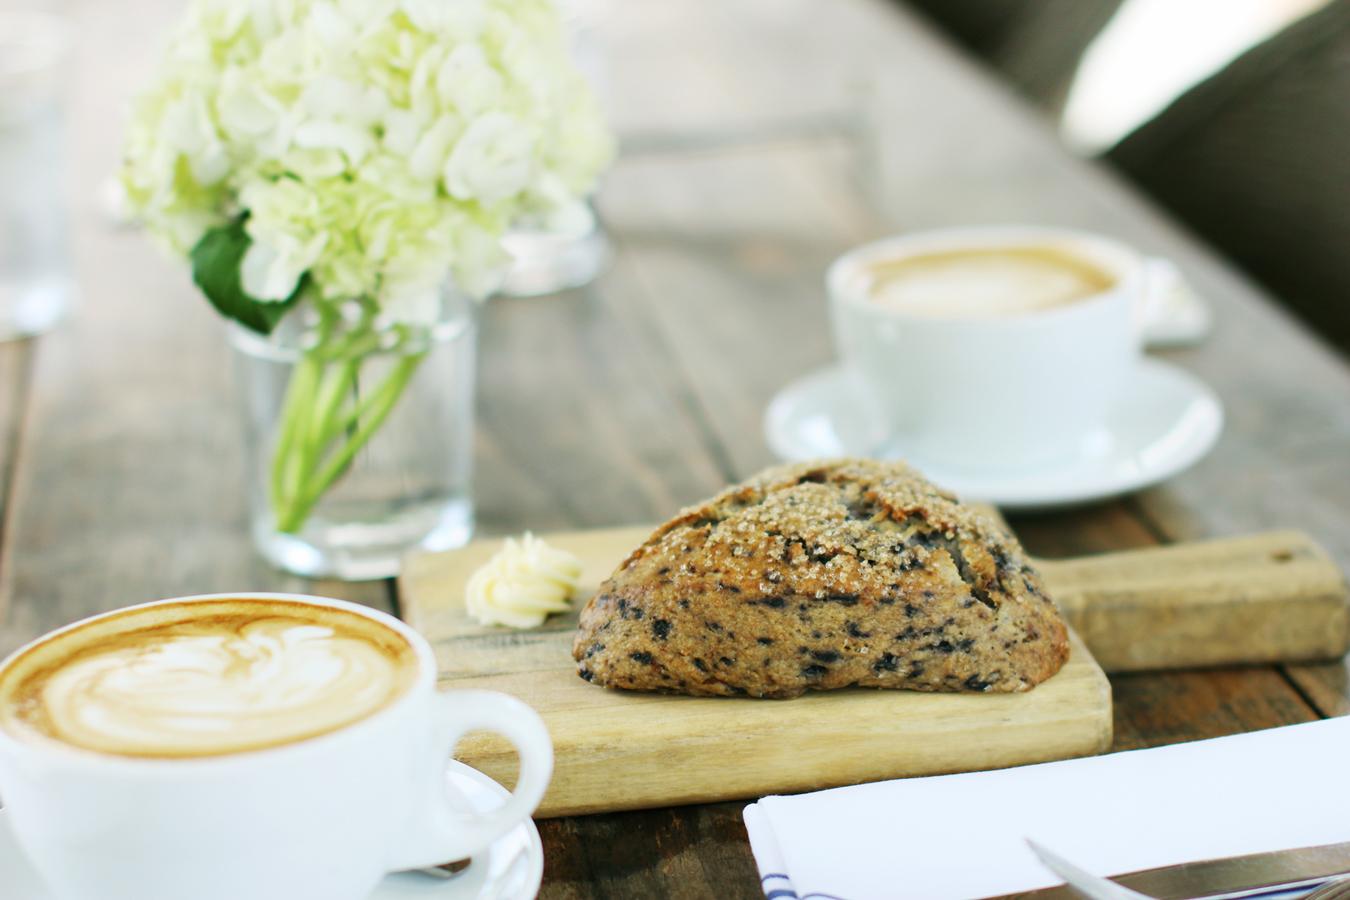 FTT-TINY-BOXWOODS-COFFEE-GREEN-PANT-HOUSTON.-9